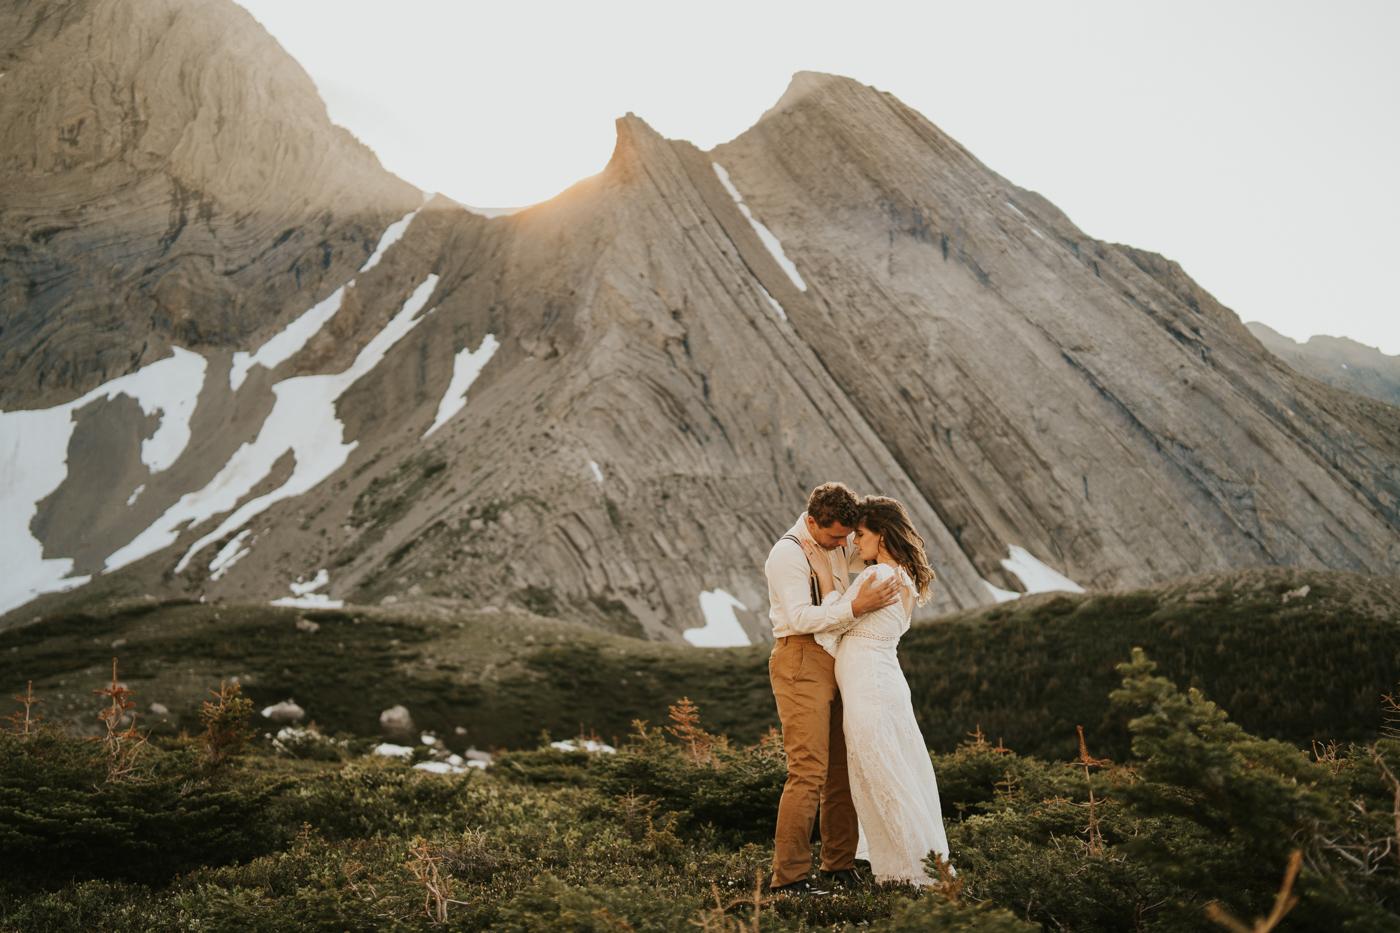 tyraephotography_photographer_wedding_elopement_engagement_photography-07952.jpg